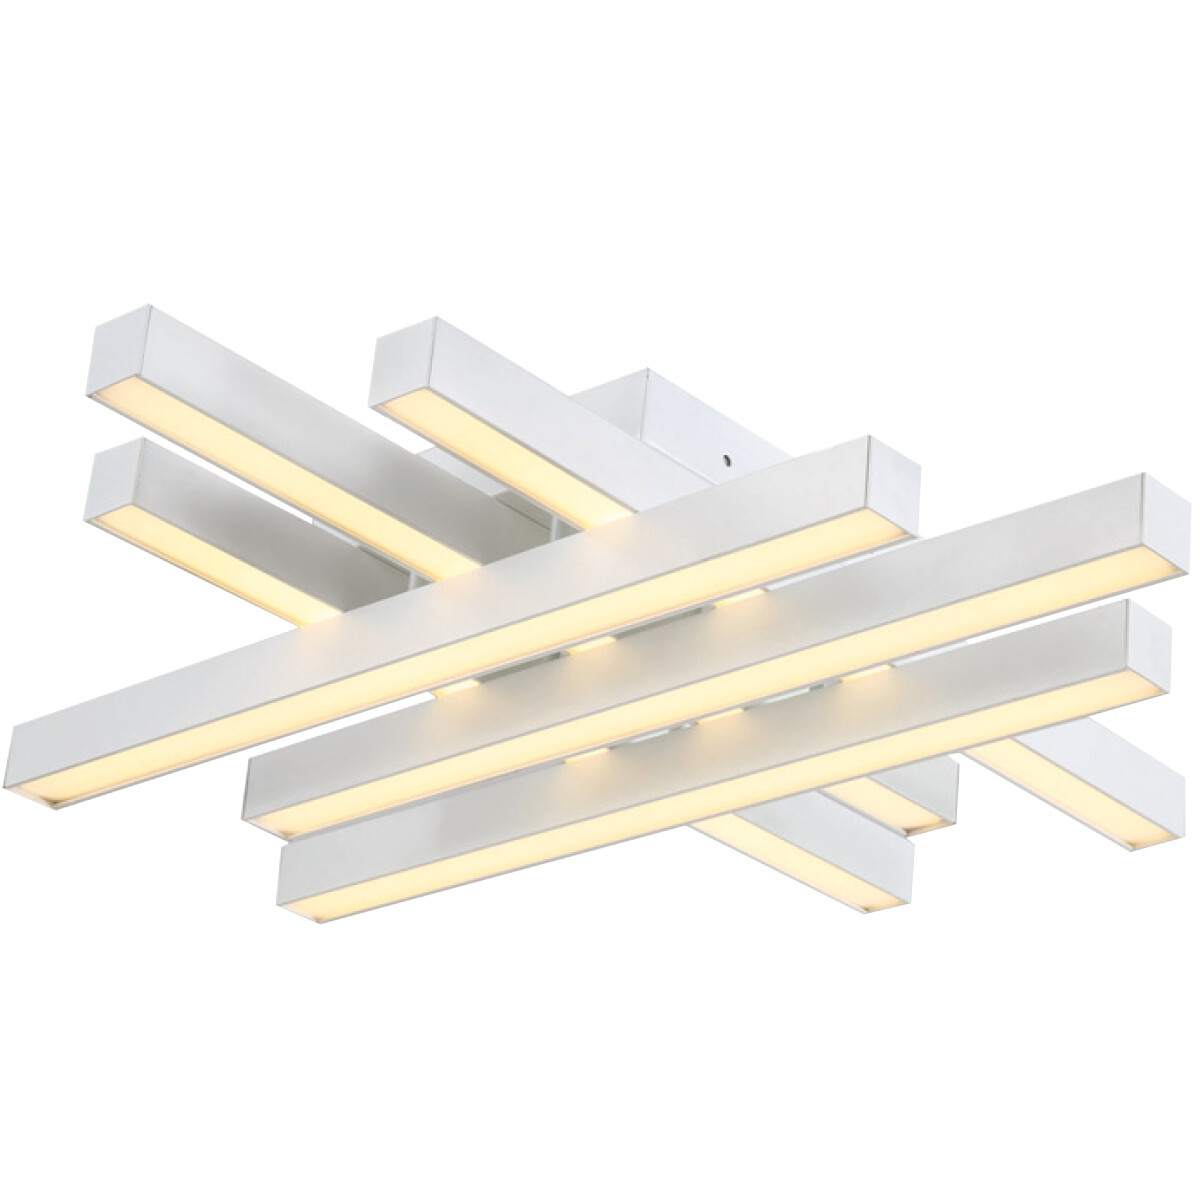 LED Plafondlamp - Plafondverlichting - Trendy - 50W - Natuurlijk Wit 4000K - Wit Aluminium